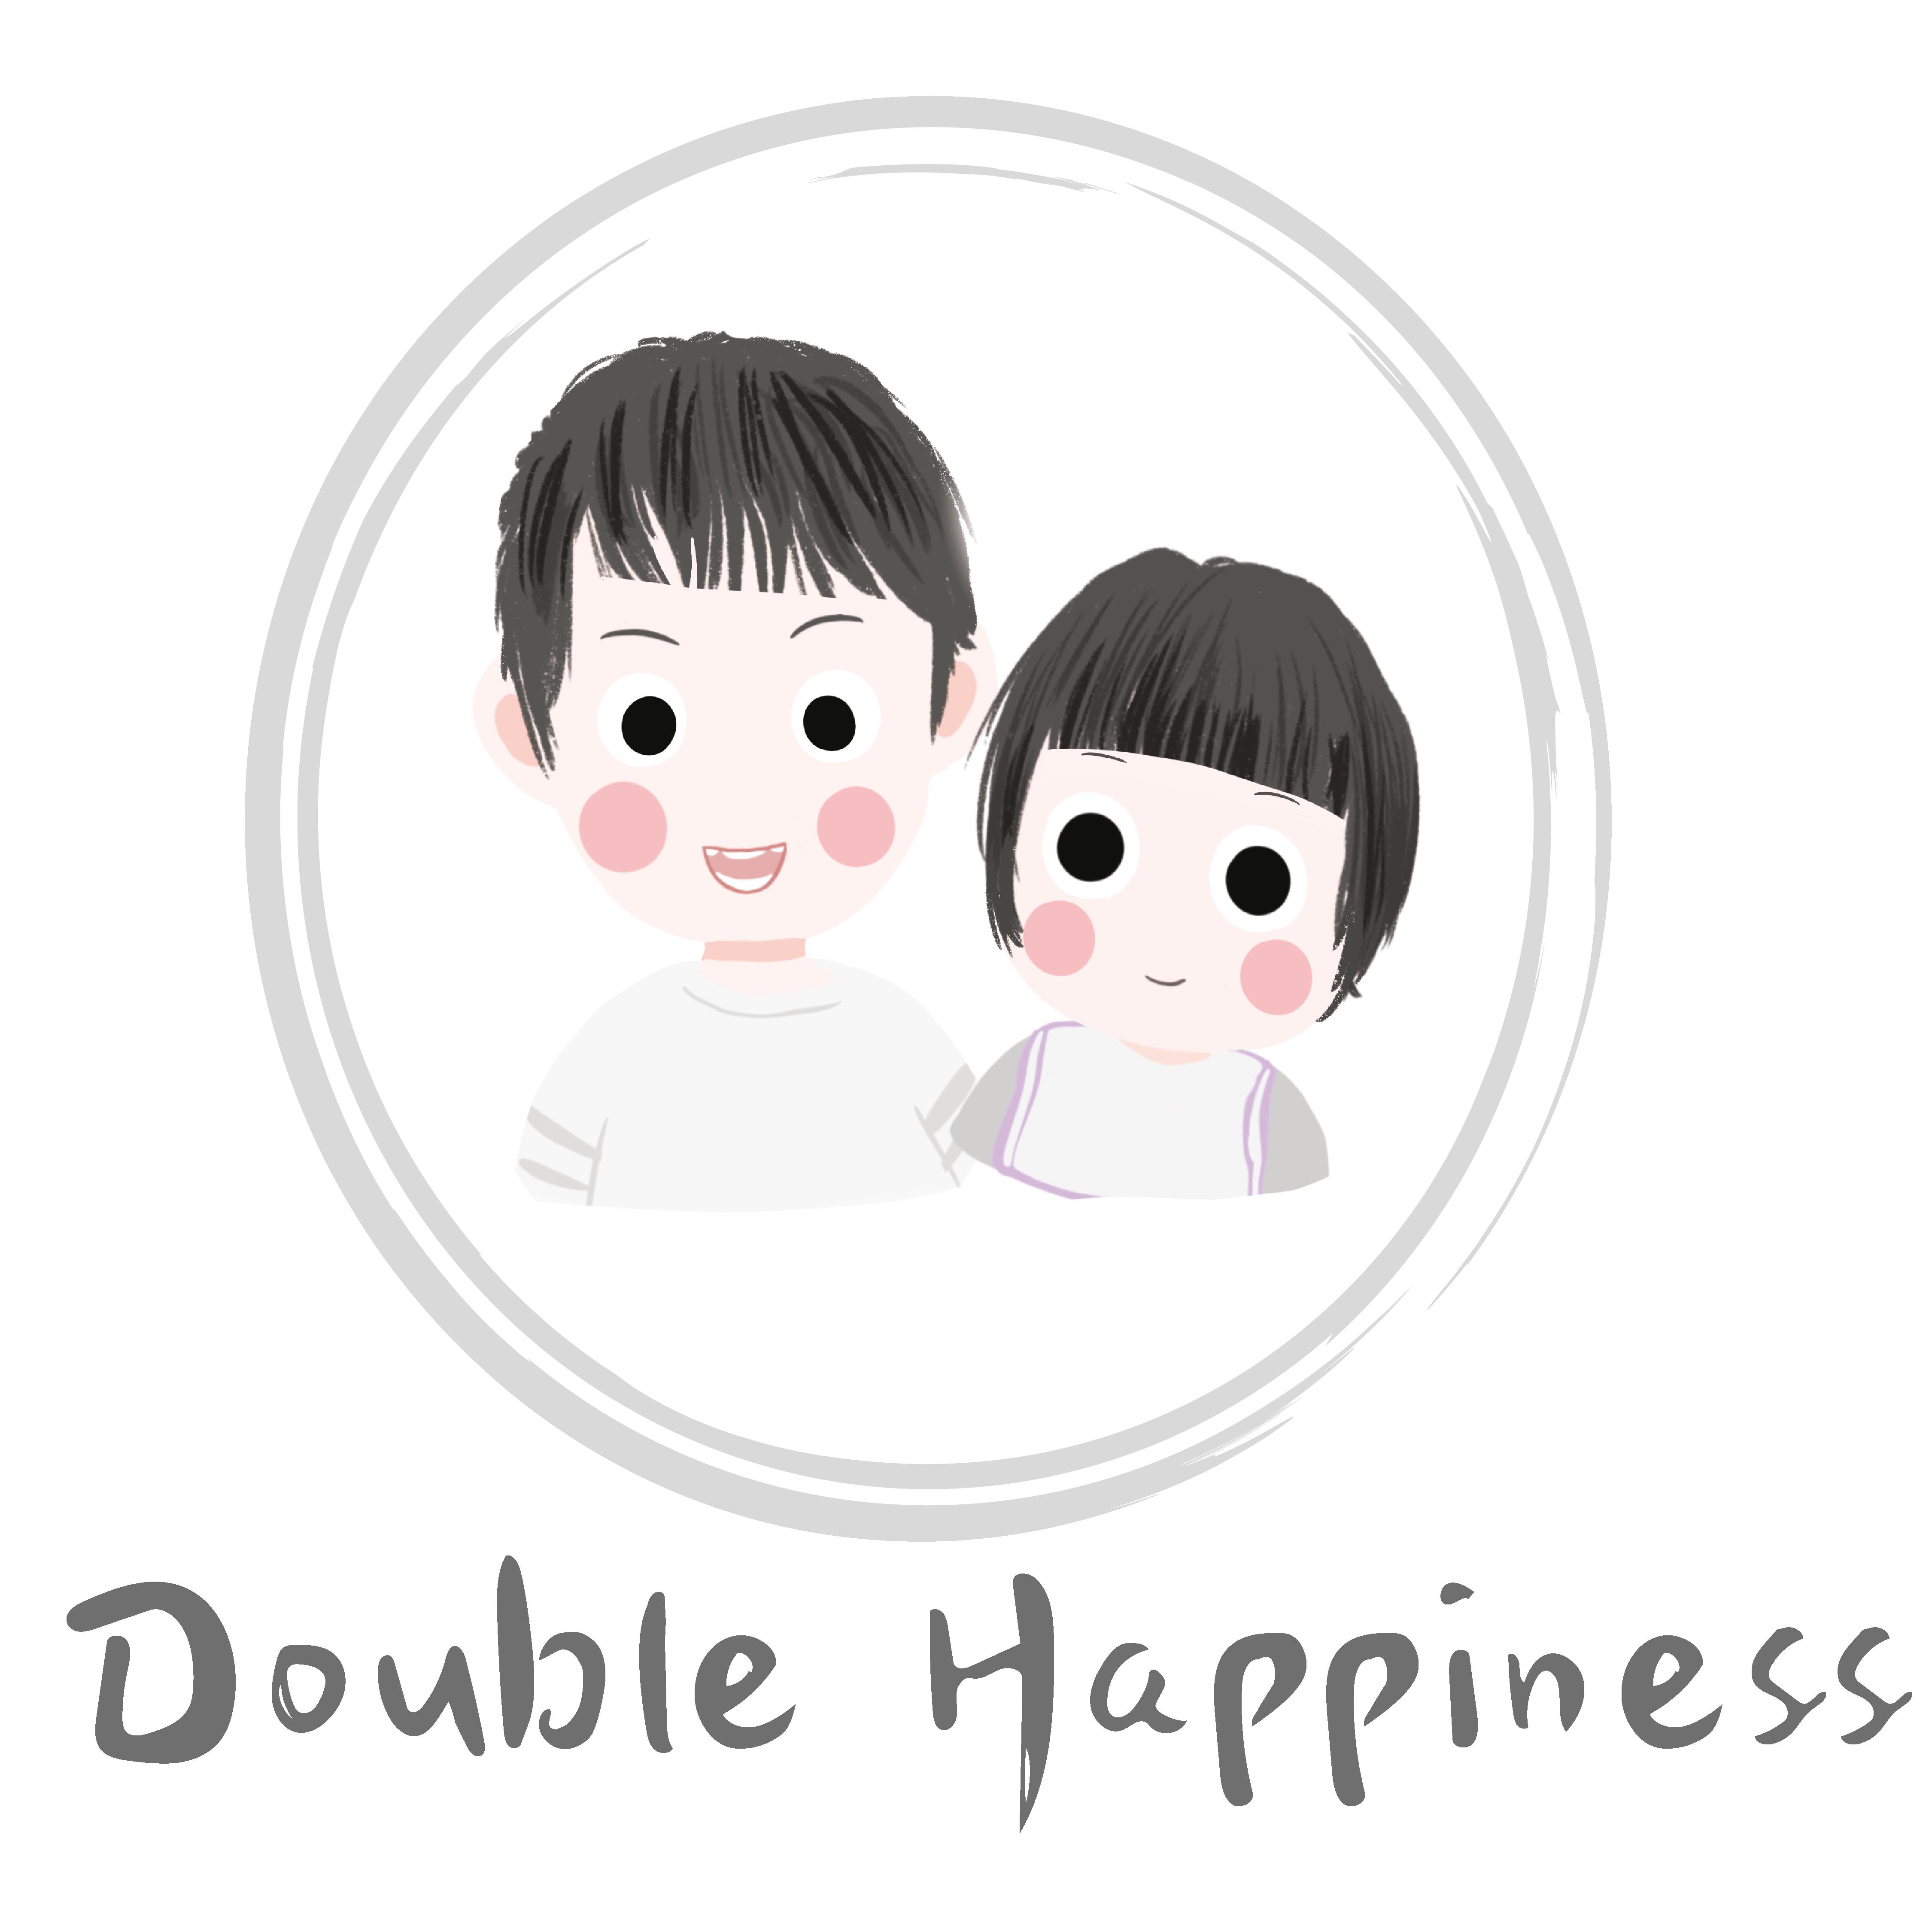 Doublehappiness_logo